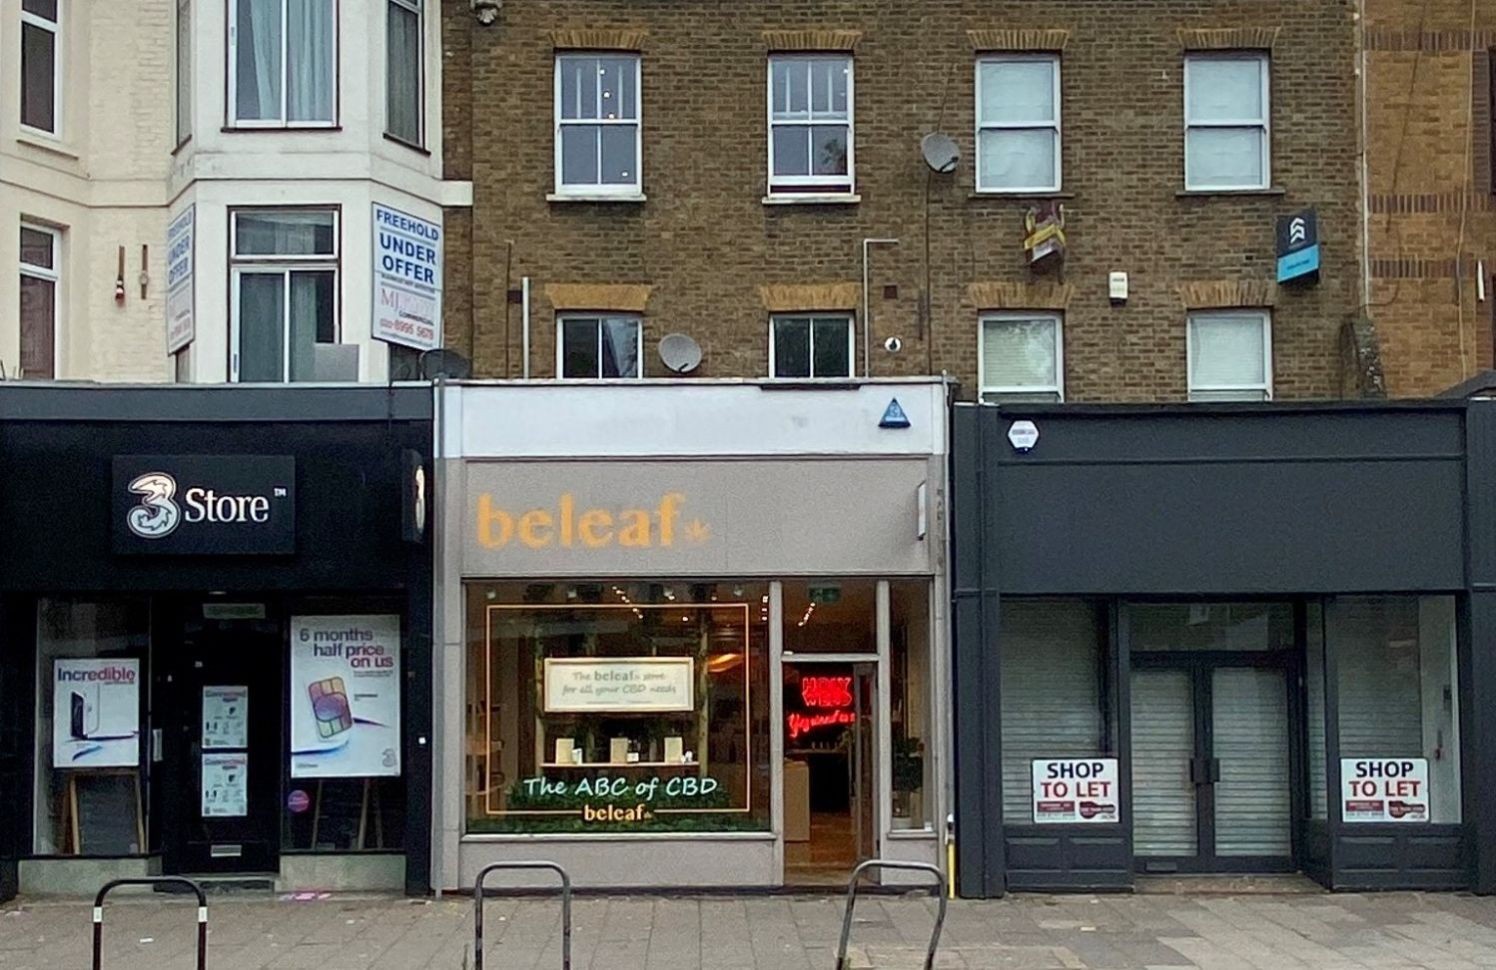 Chiswick shop 1 exterior_web